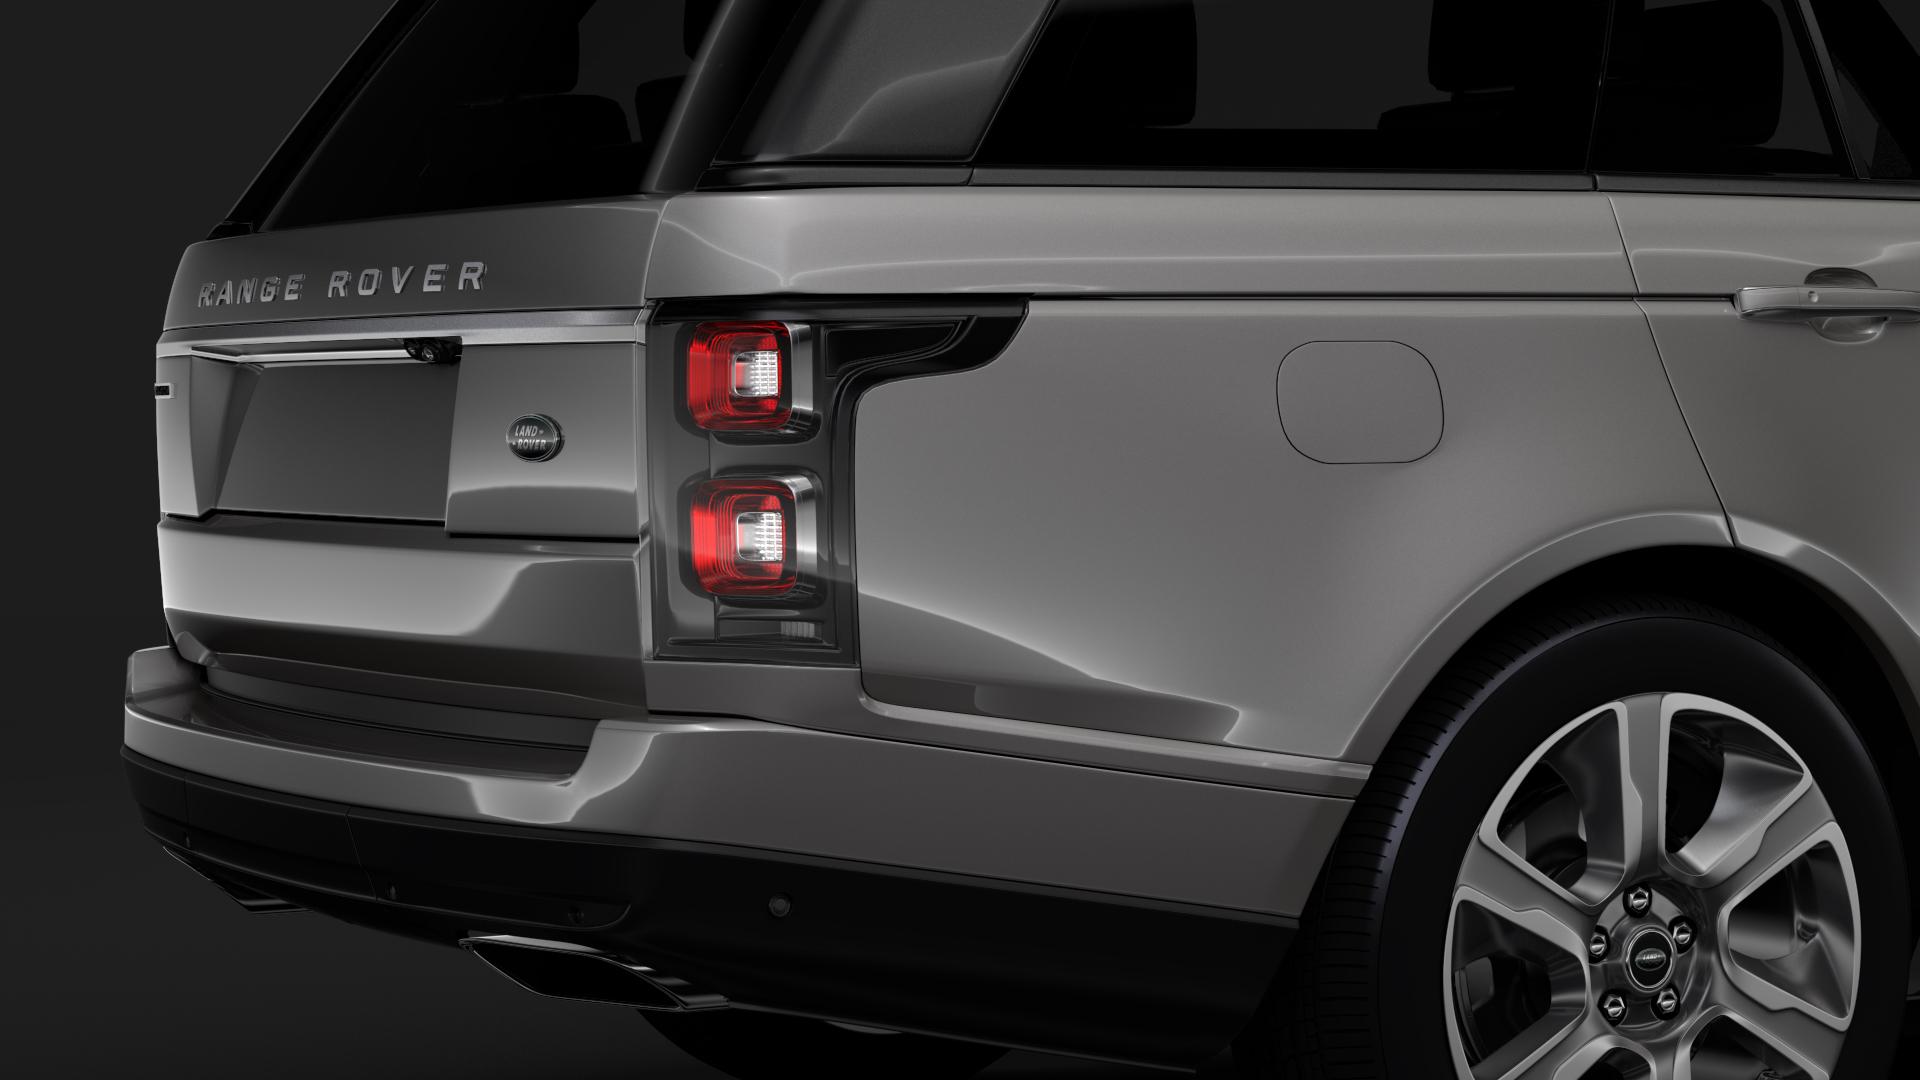 range rover hybrid lwb l405 2018 3d model max fbx c4d lwo ma mb hrc xsi obj 277421